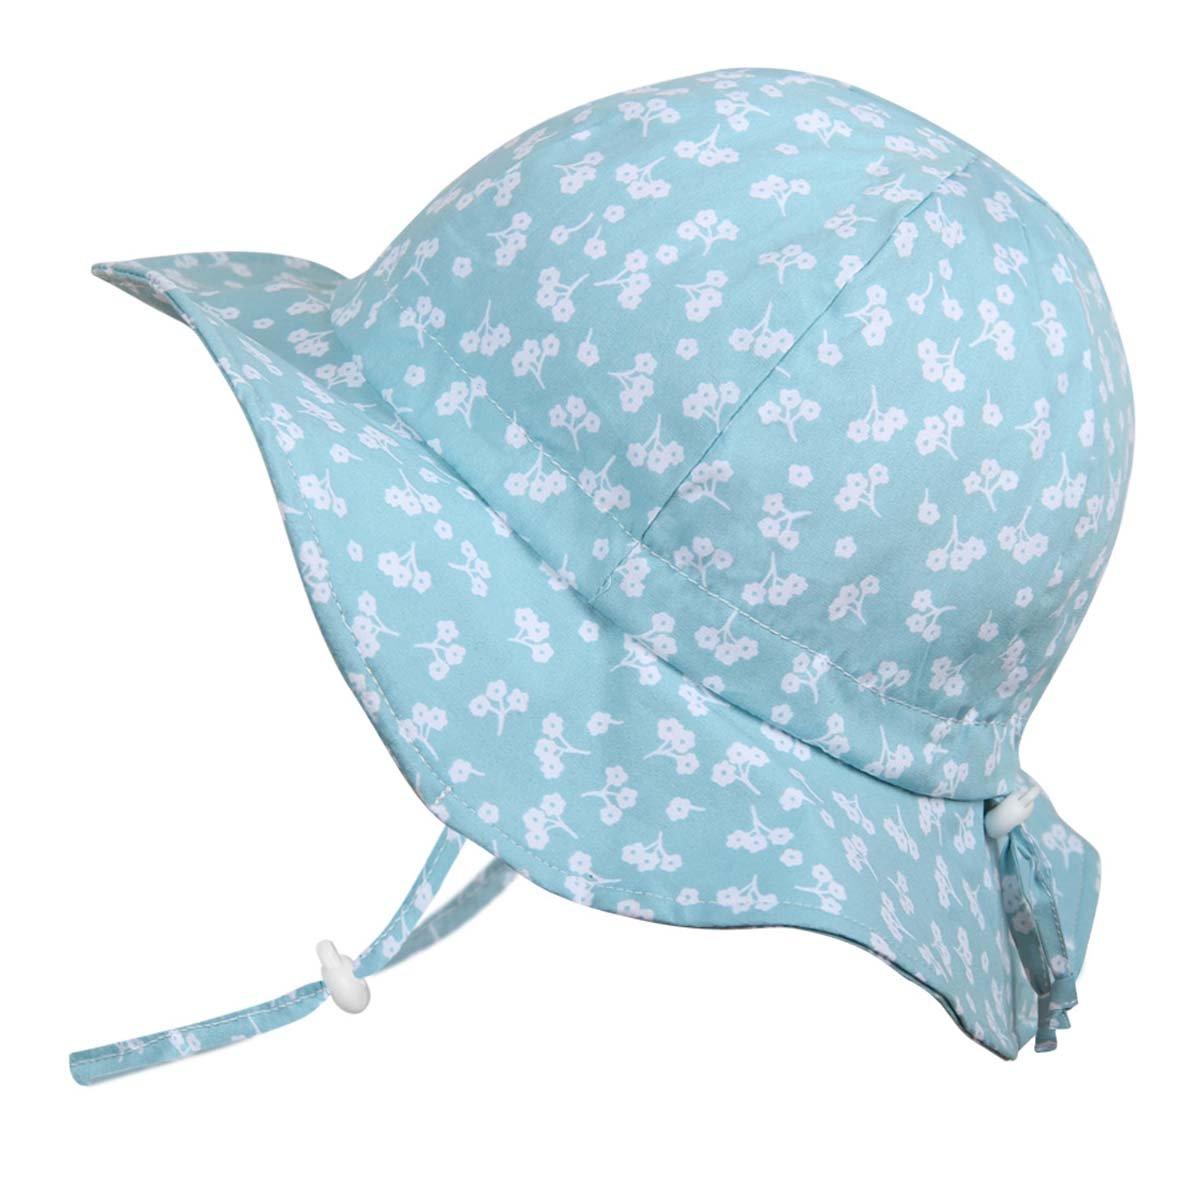 JAN & JUL Toddler Girls Breathable Flower Sun Hat 50 UPF, Adjustable with Tie, Foldable (M: 6-24m, Floppy Hat: Mint Flower) by JAN & JUL